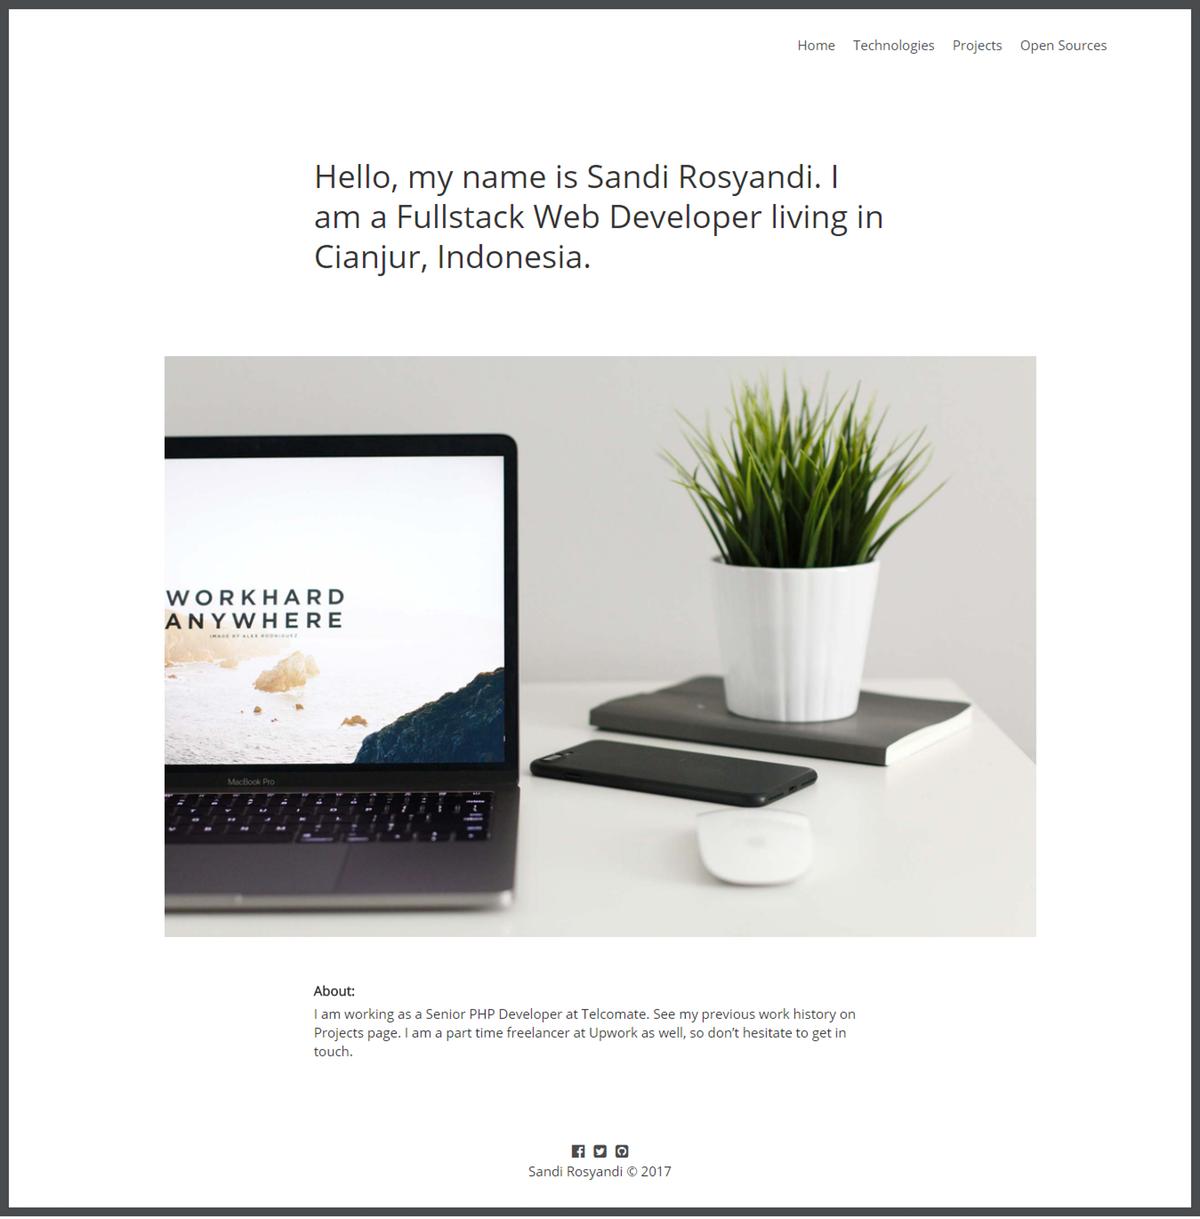 Deploy a Vue Portfolio Site in 3 Steps - By Carson